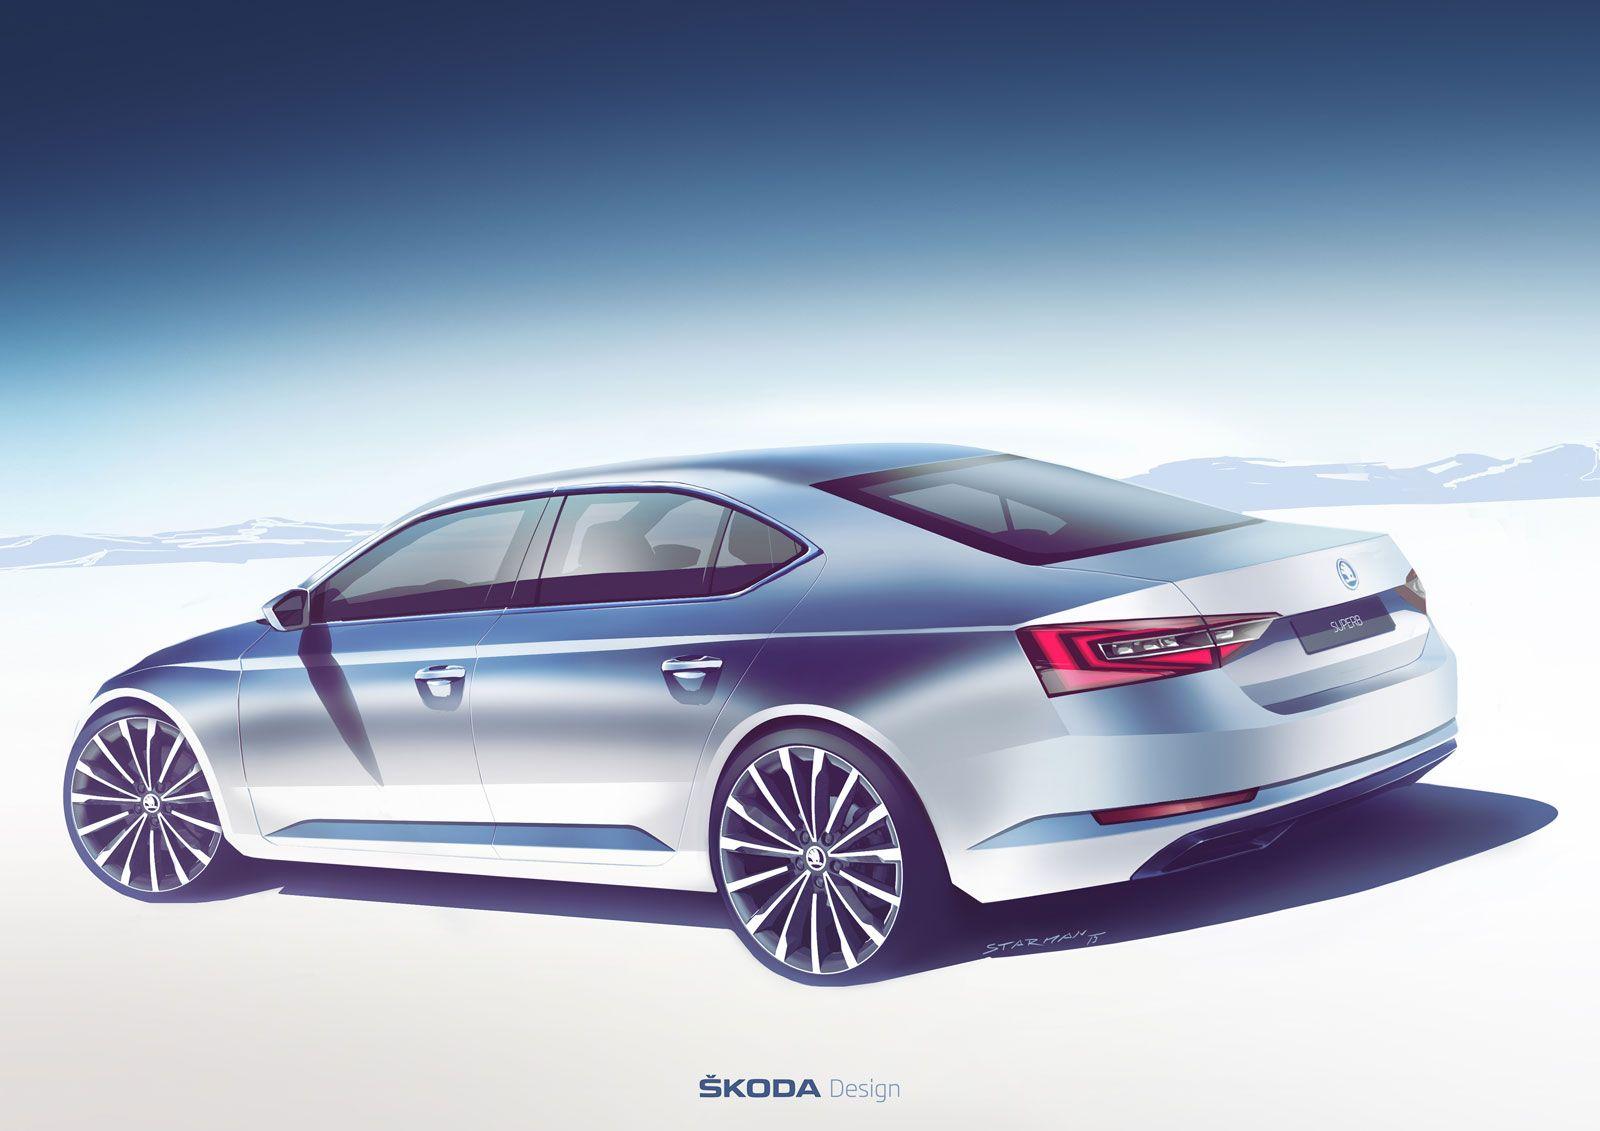 01 New Skoda Superb Design Sketch 02 Jpg 1600 1131 Skoda